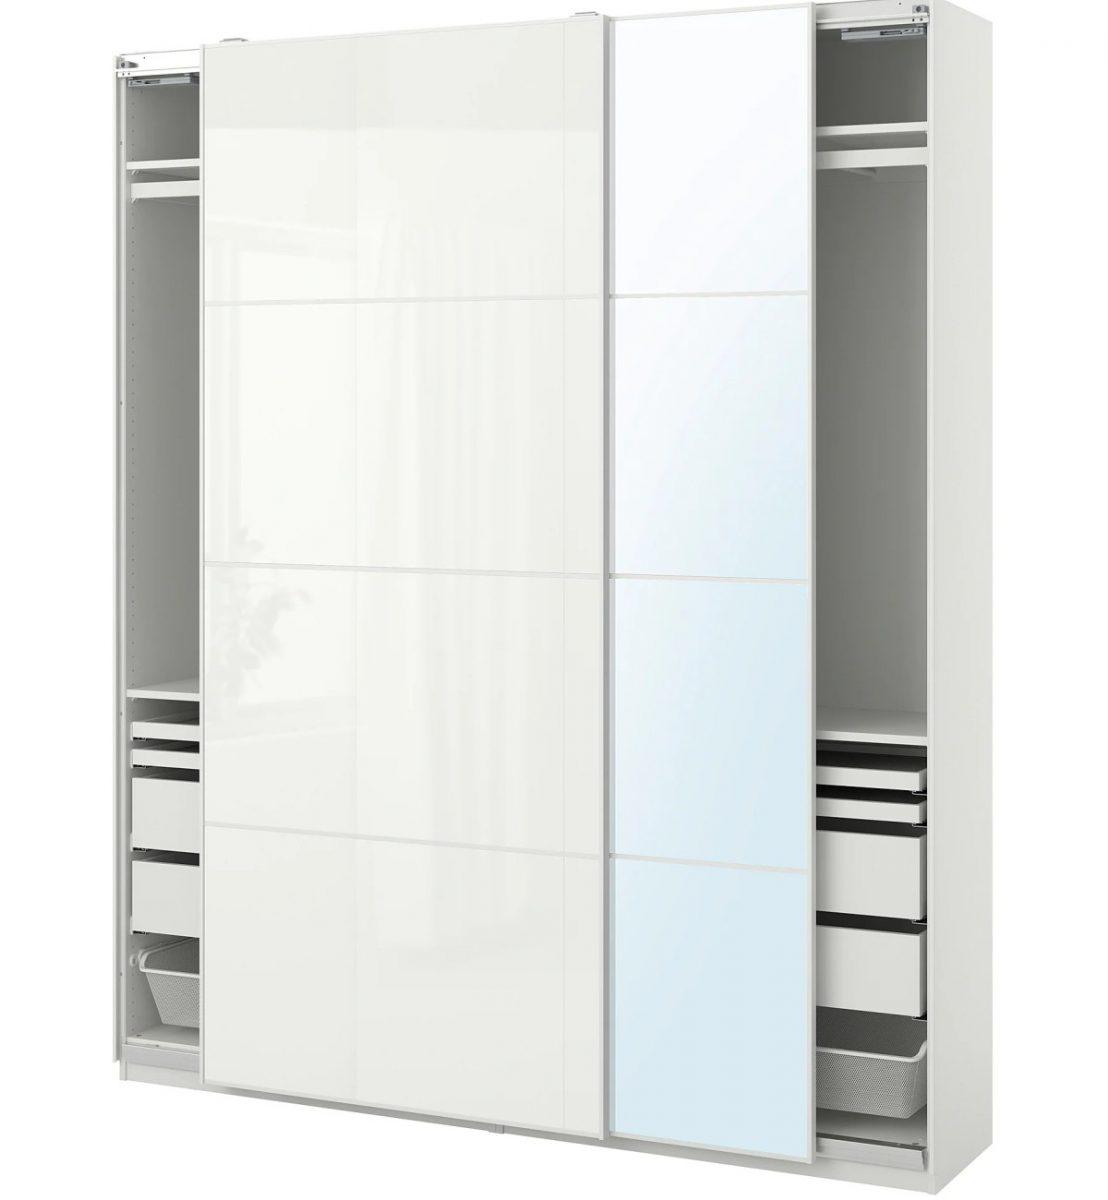 ante-scorrevoli-ikea-bianco-vetro